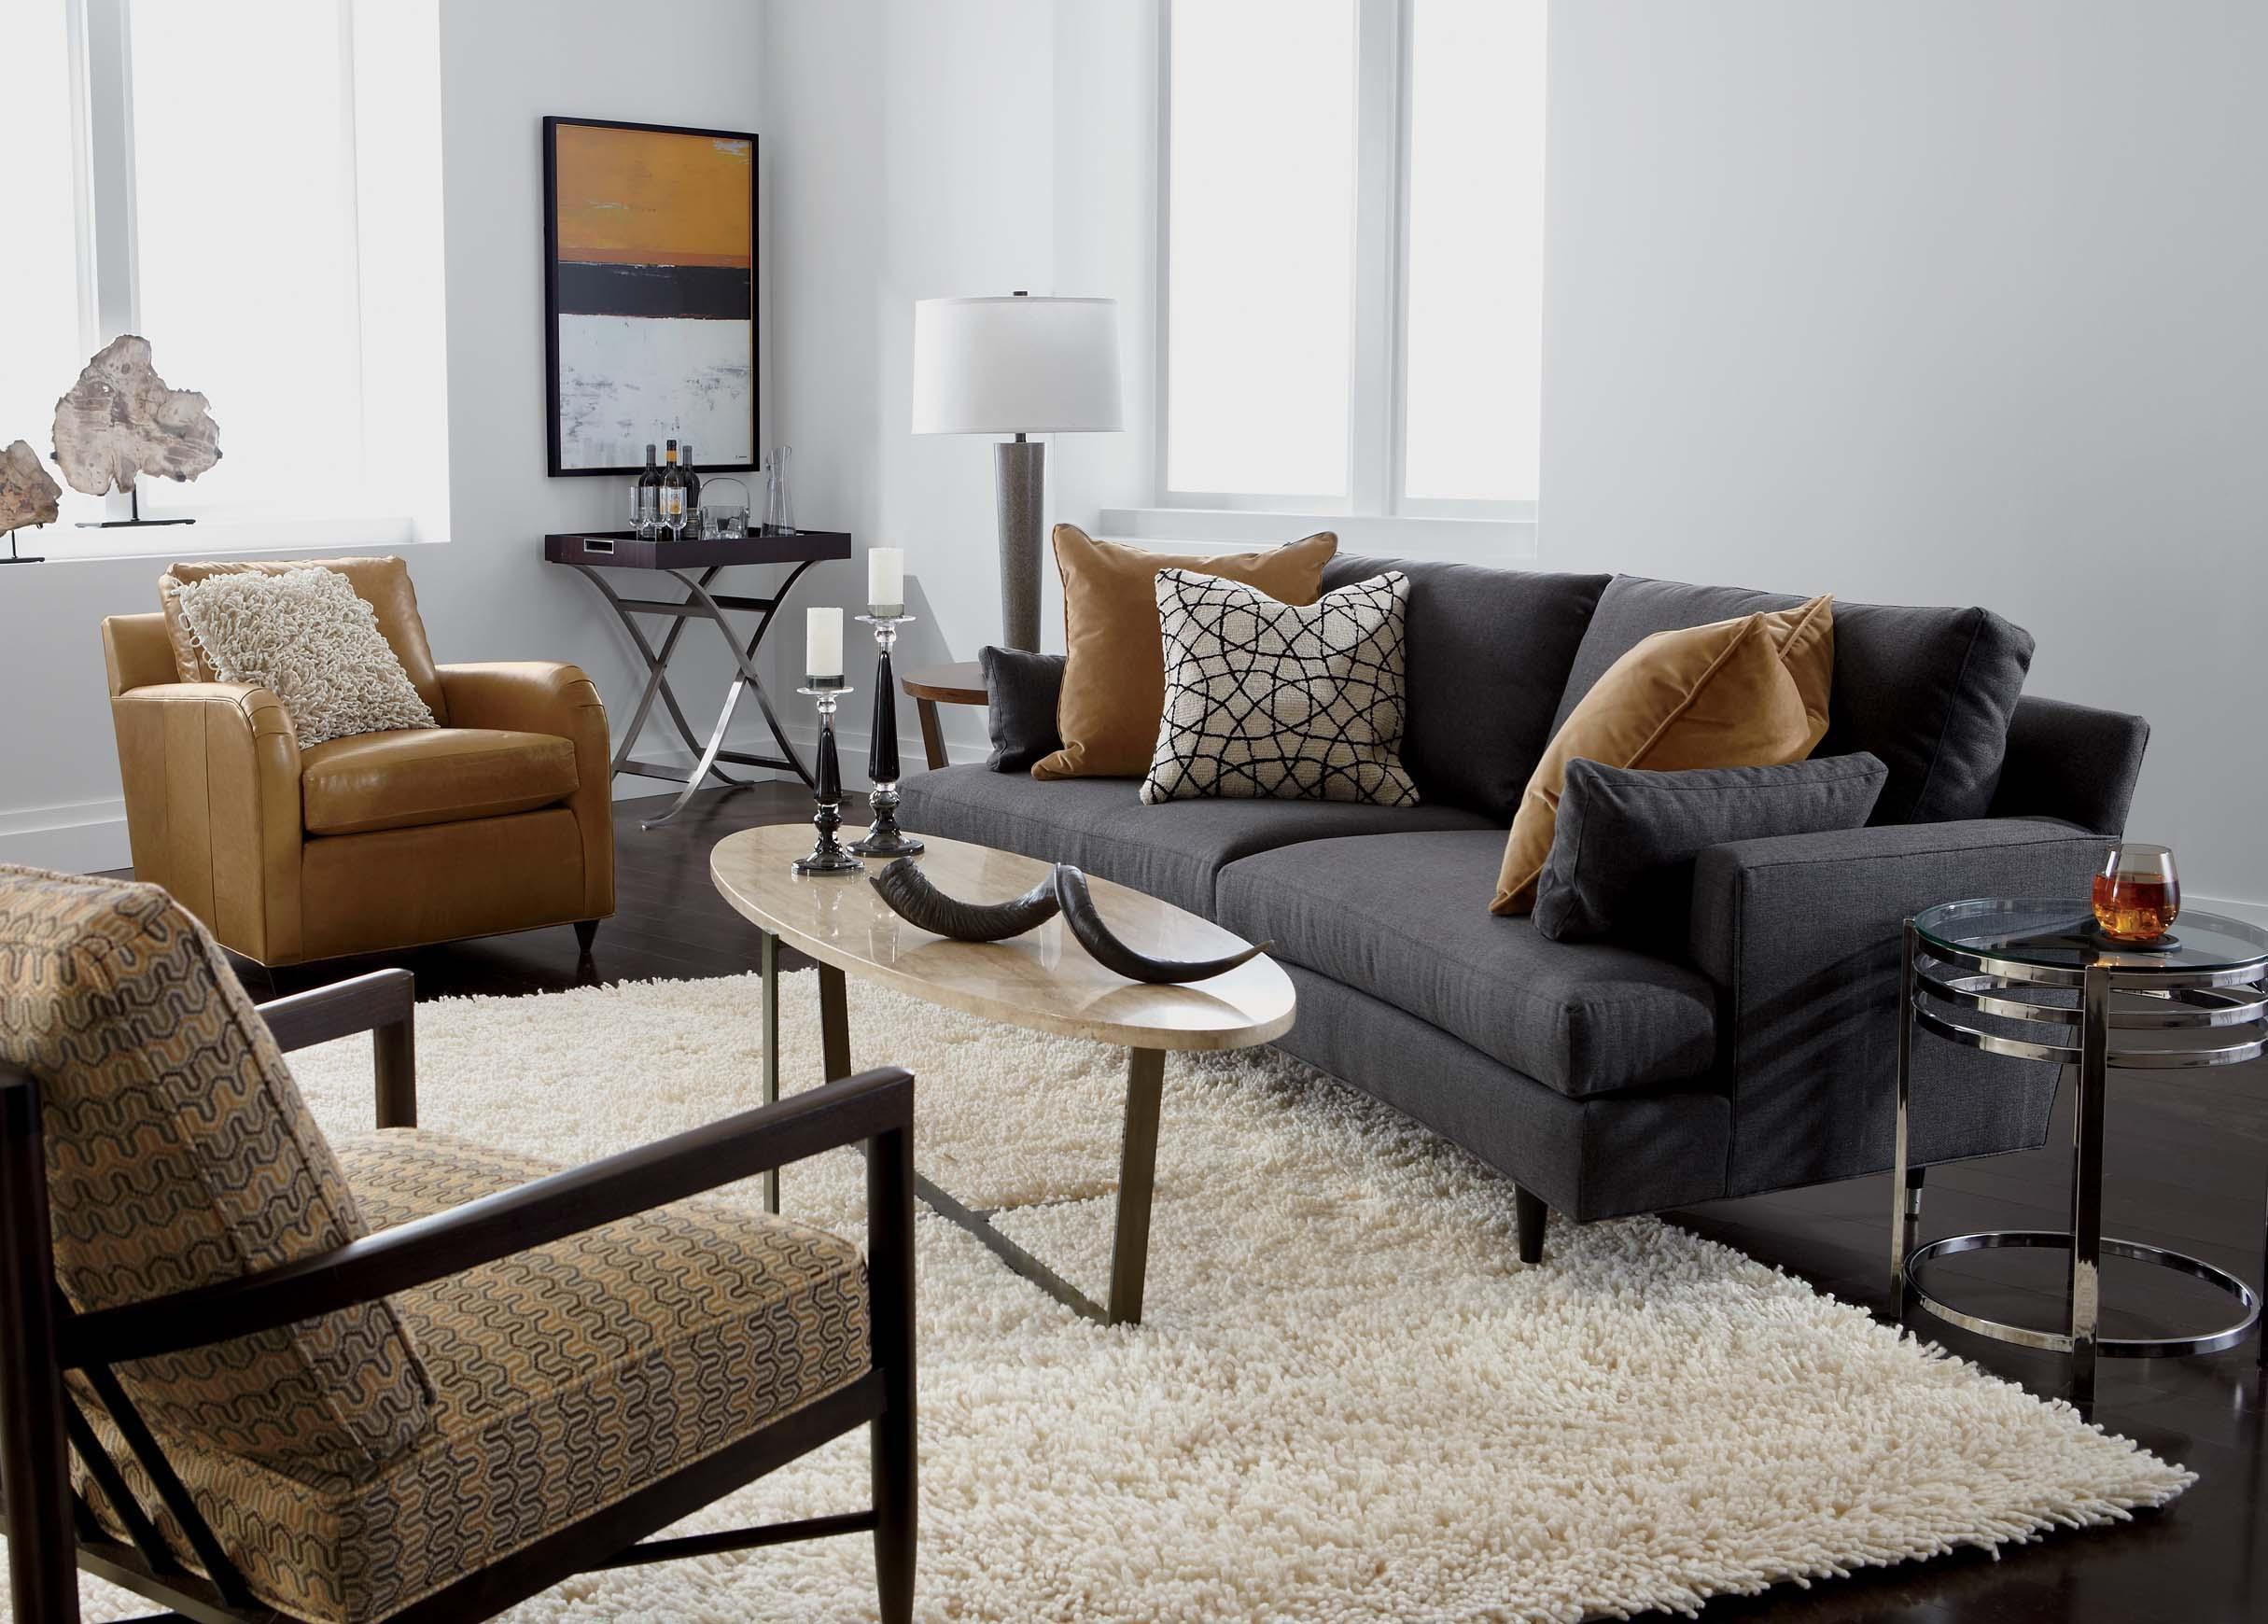 Apollo Living Room | Ethan Allen Regarding Ethan Allen Sofas And Chairs (View 12 of 20)